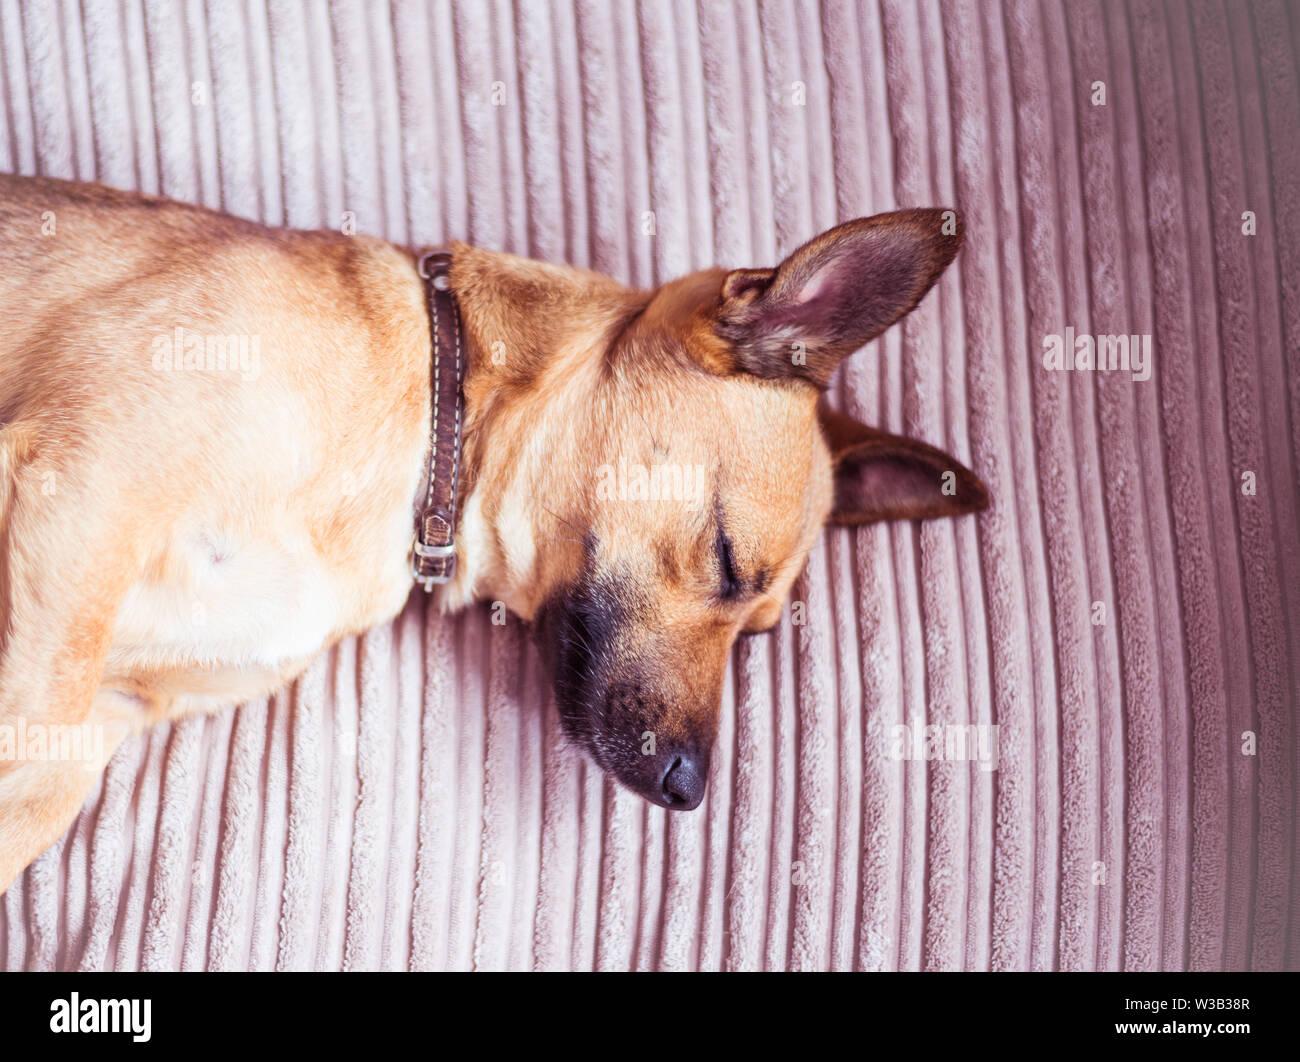 Cute dog sleeping on a sofa - Stock Image